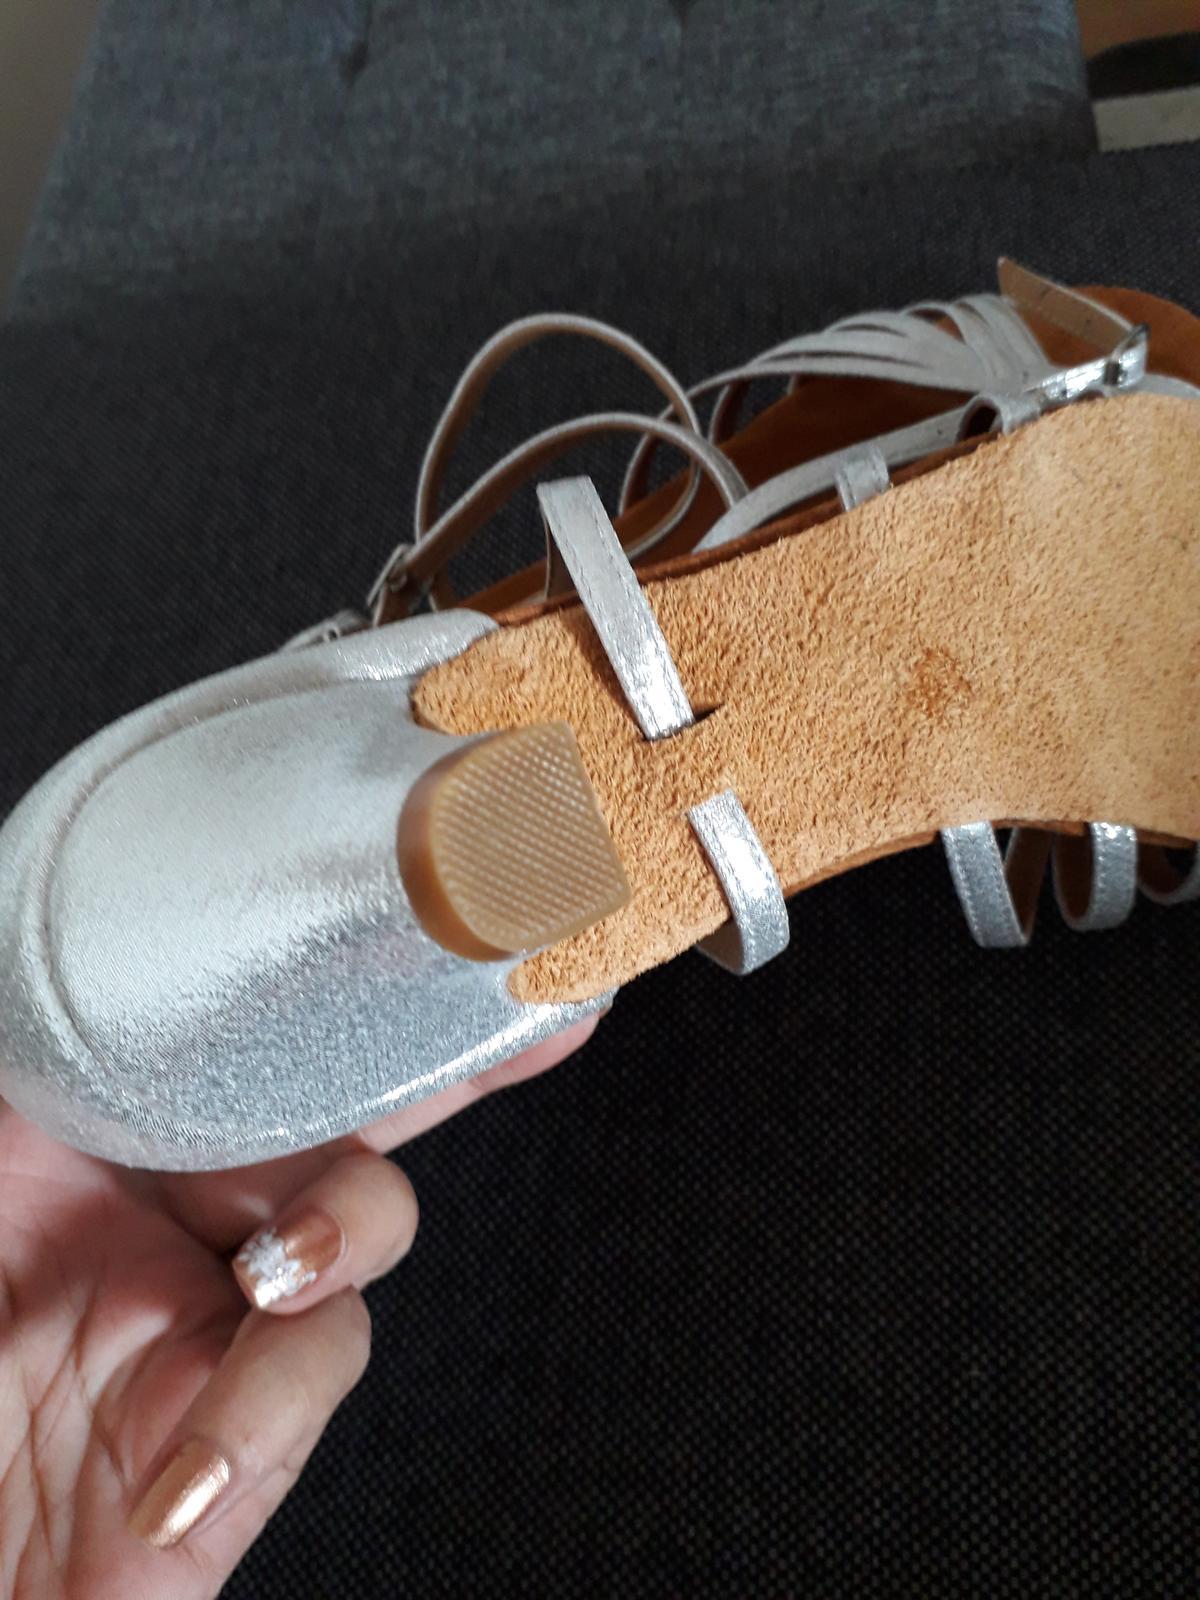 Sandále nízky opätok - Obrázok č. 3